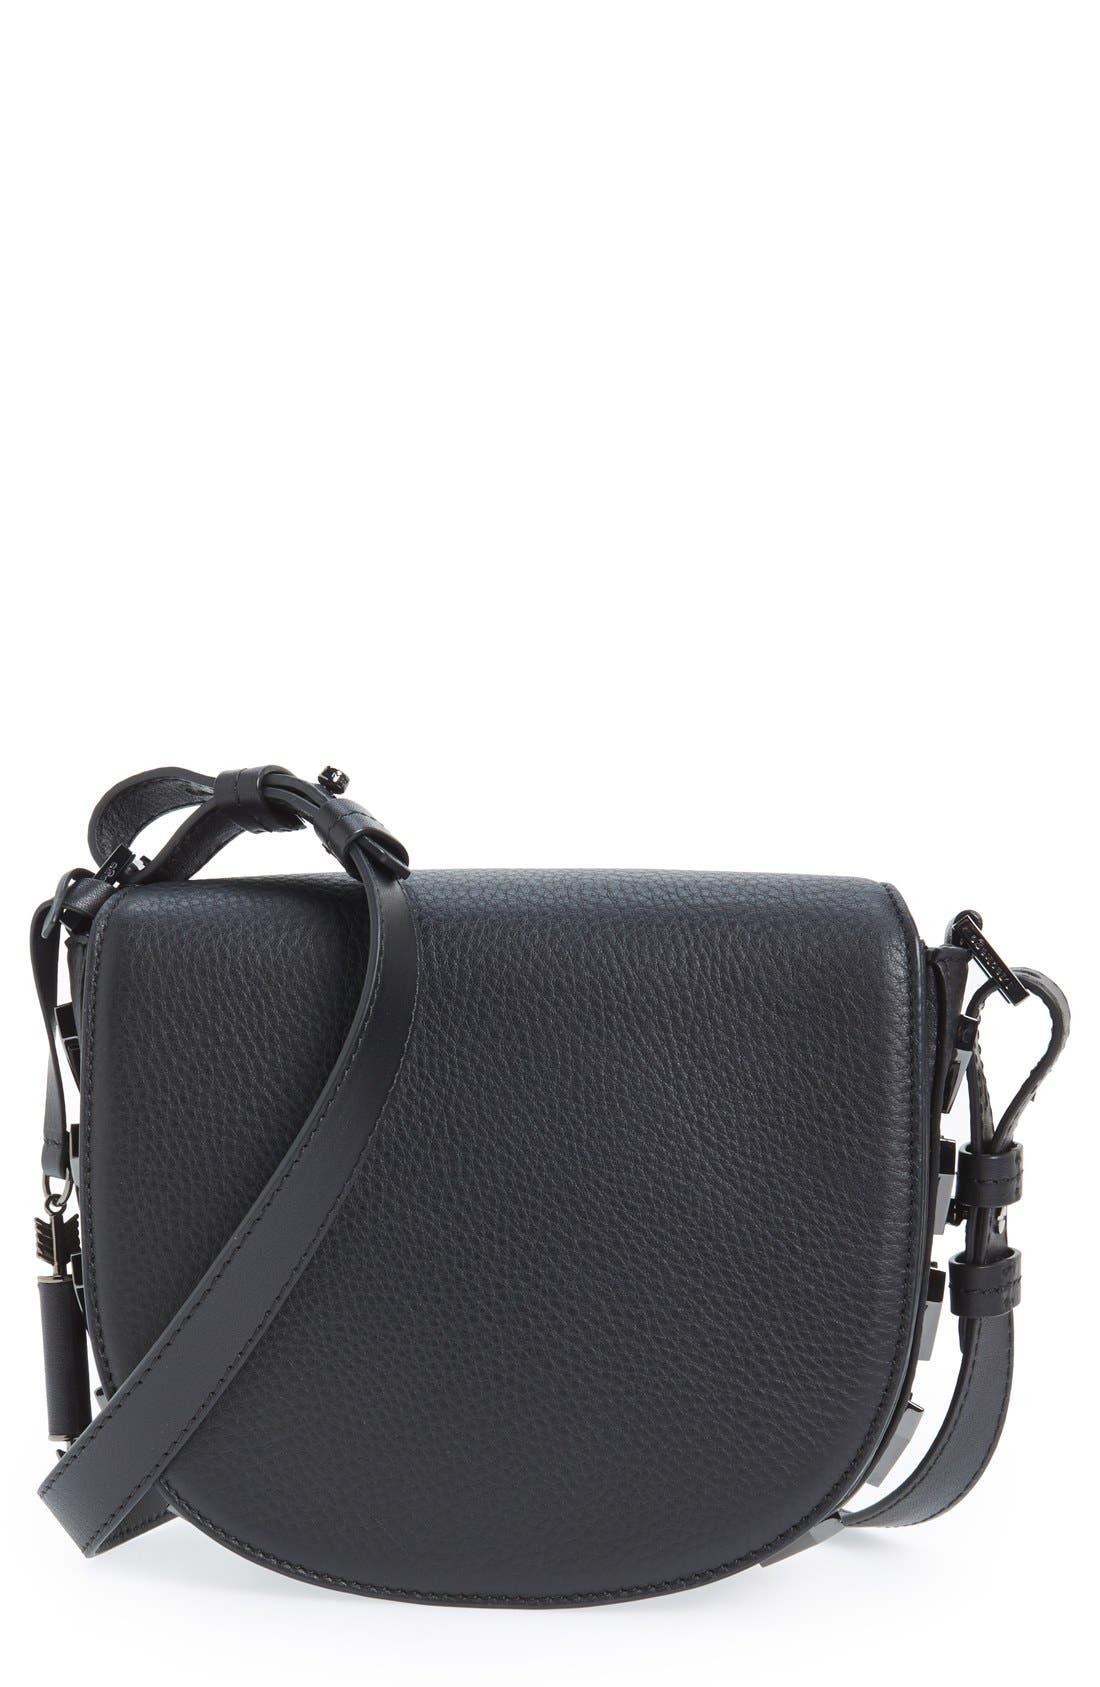 MACKAGE Rima Leather Crossbody Bag